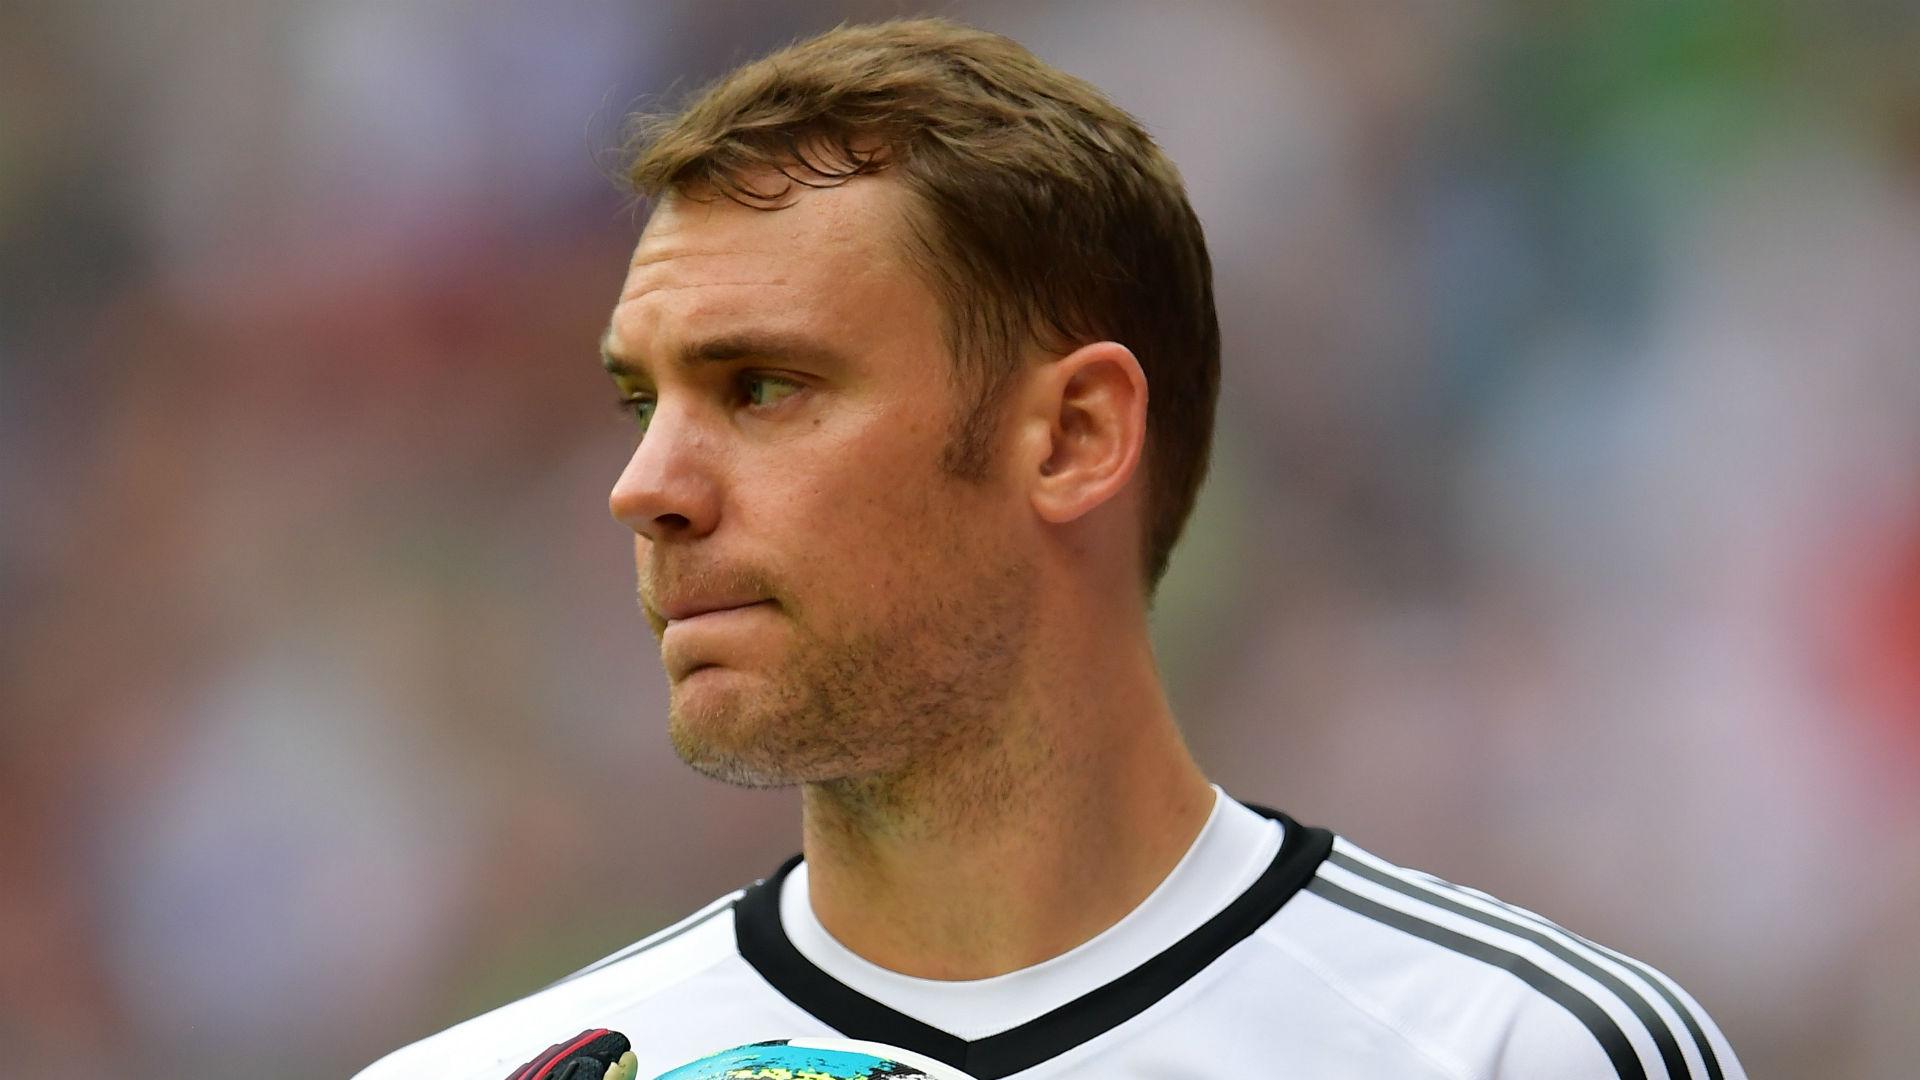 c79a2ade195 Heynckes uncertain of Neuer s World Cup chances